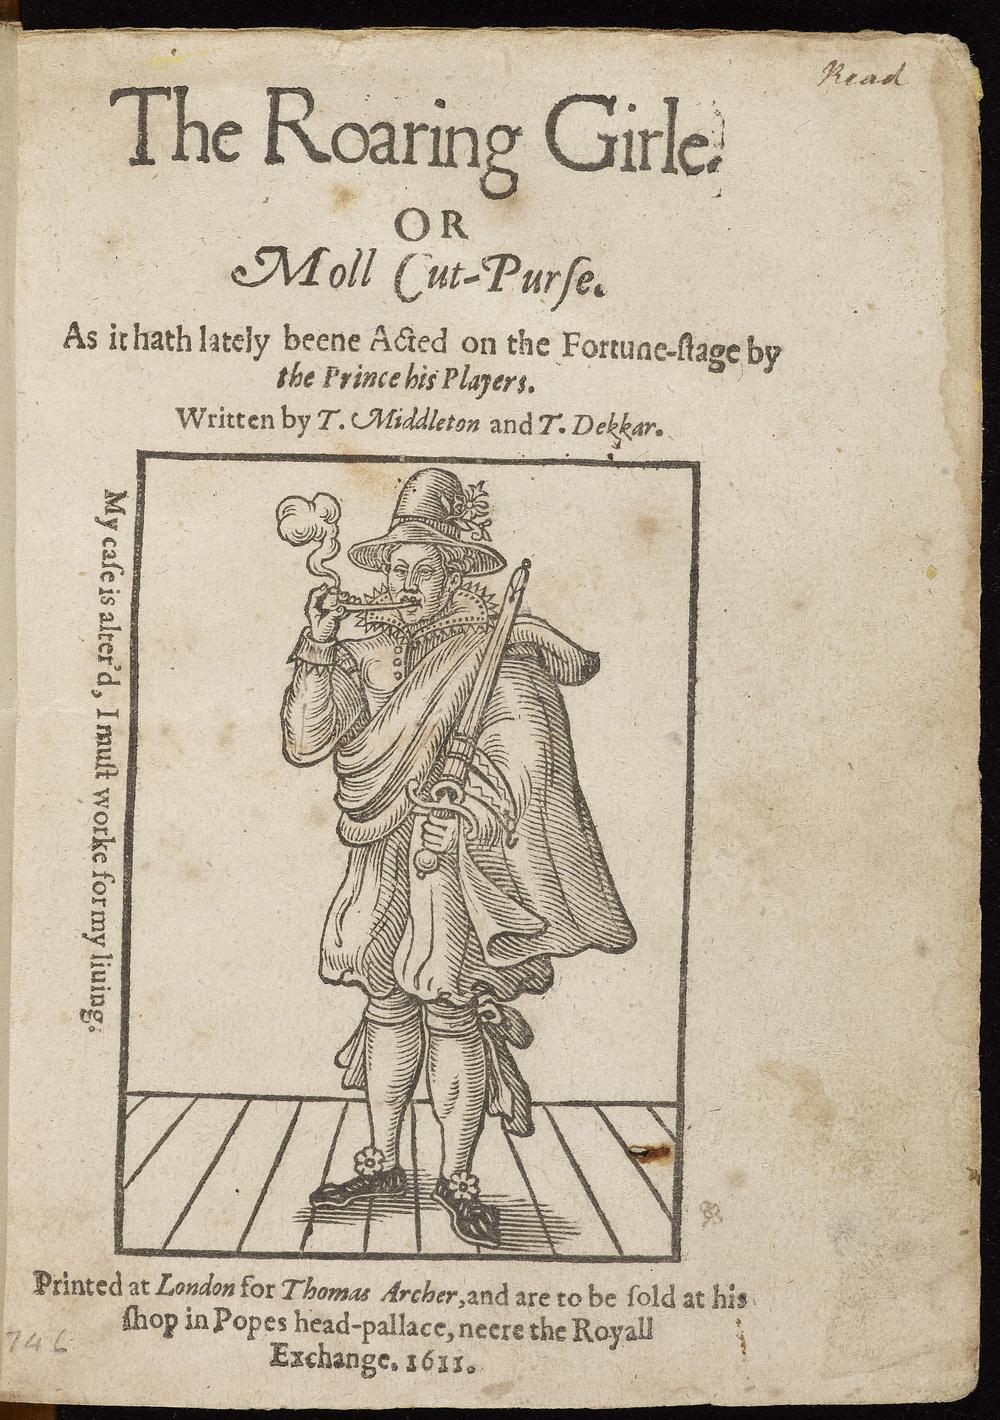 Thomas Dekker, The roaring girle, or Moll Cut-purse